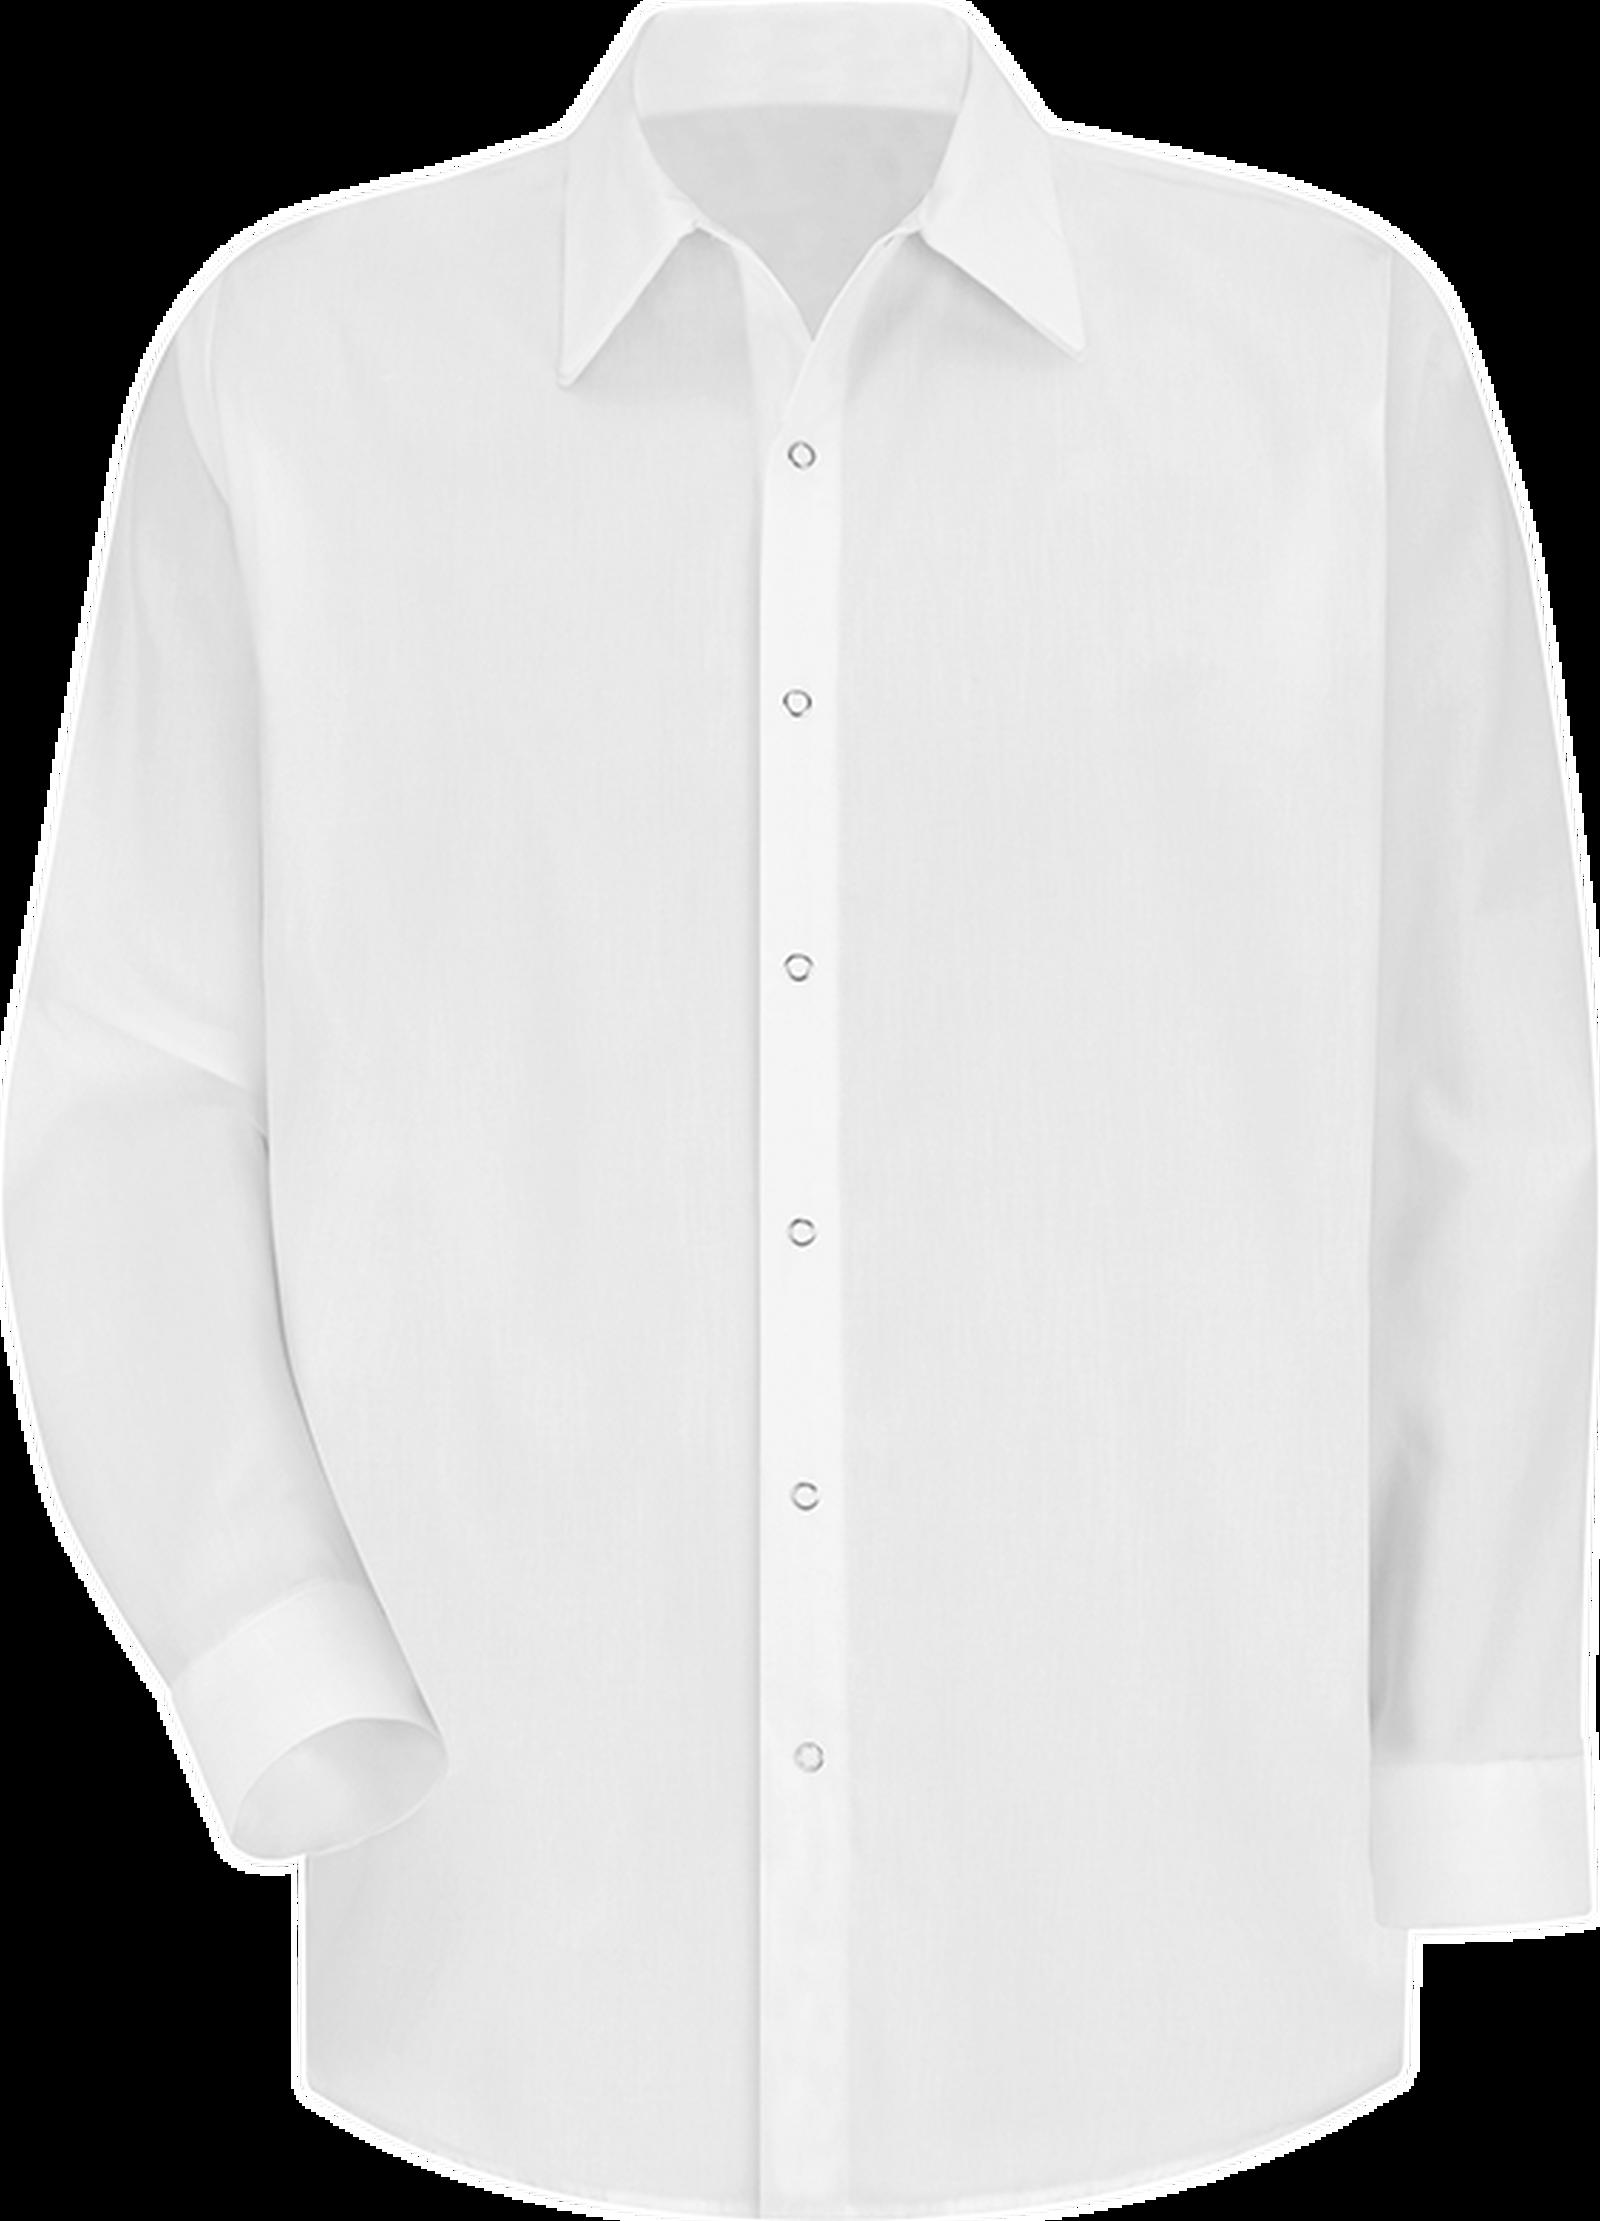 Men's Long Sleeve Specialized Pocketless Polyester Work Shirt